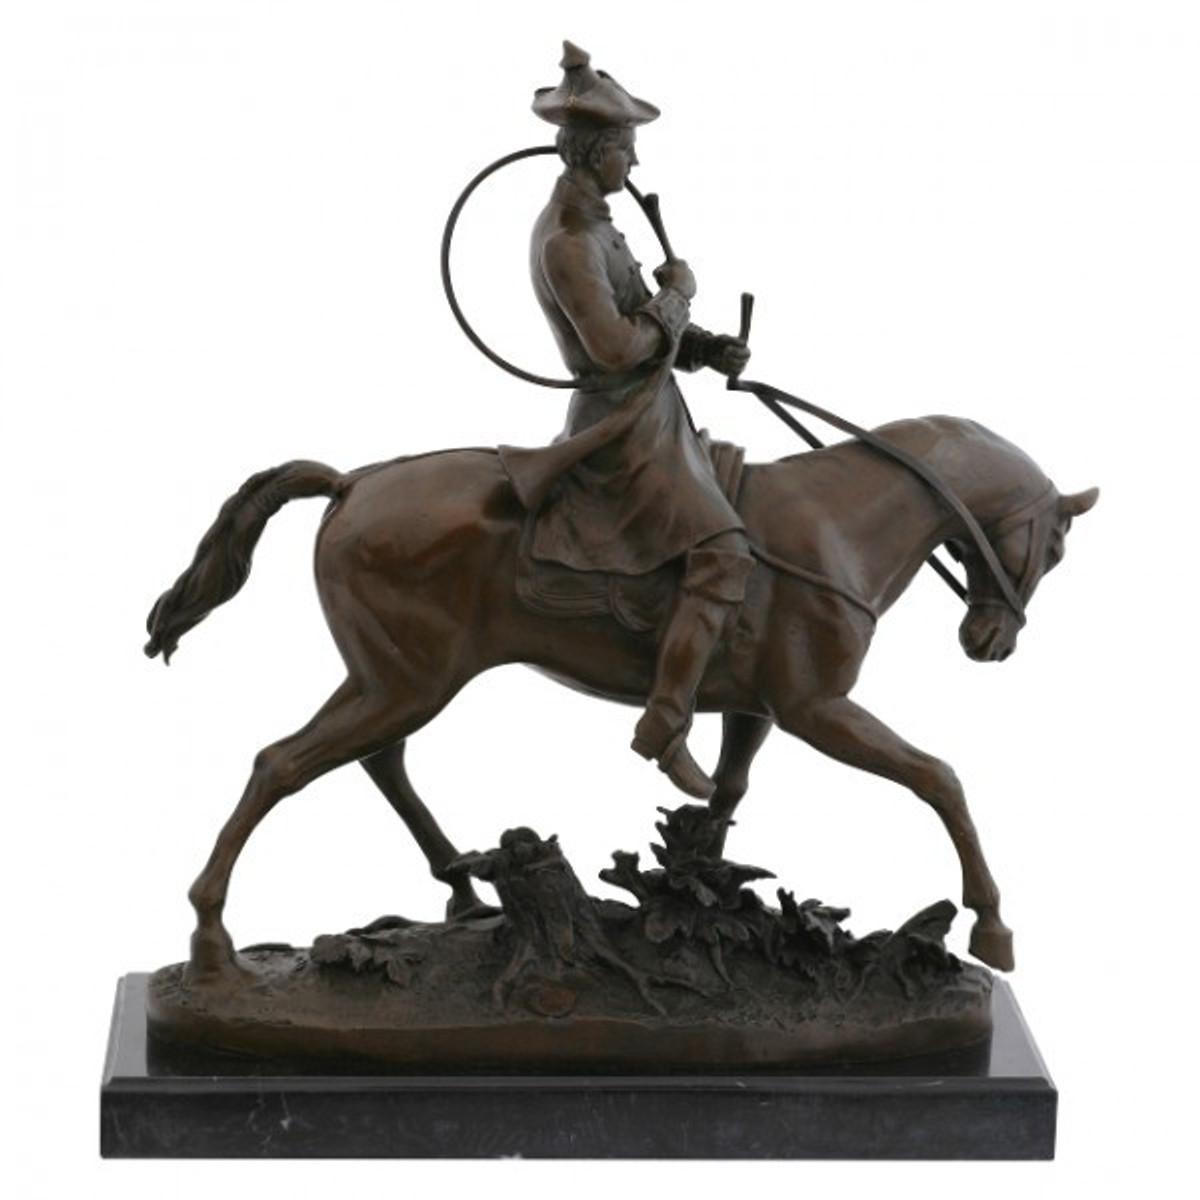 Bronze Pferd Kavallerie Pferd Bronzestatue berittener Soldat in Form einer Bronze Statue. Bestellen Sie direkt online.